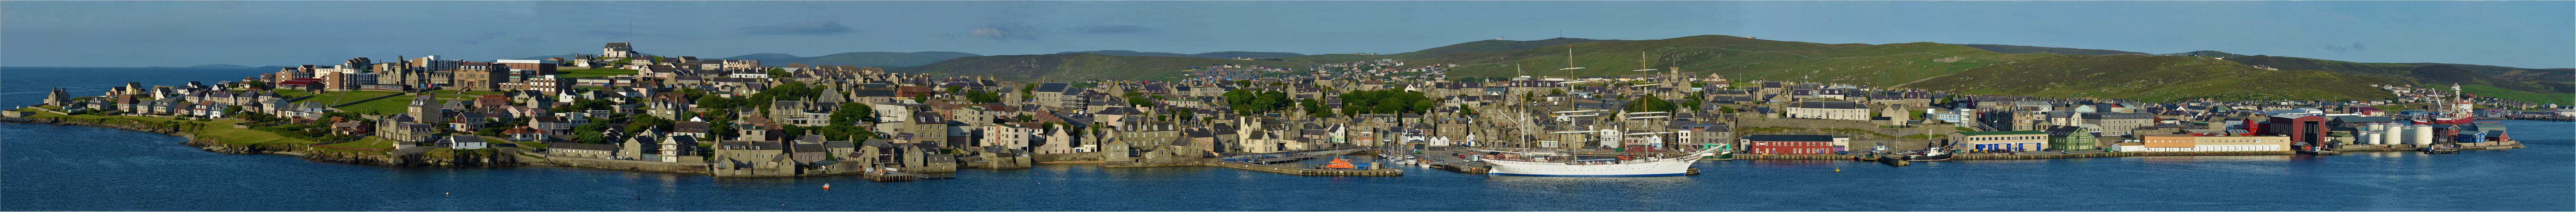 Lerwick - Hauptstadt der Shetland Inseln